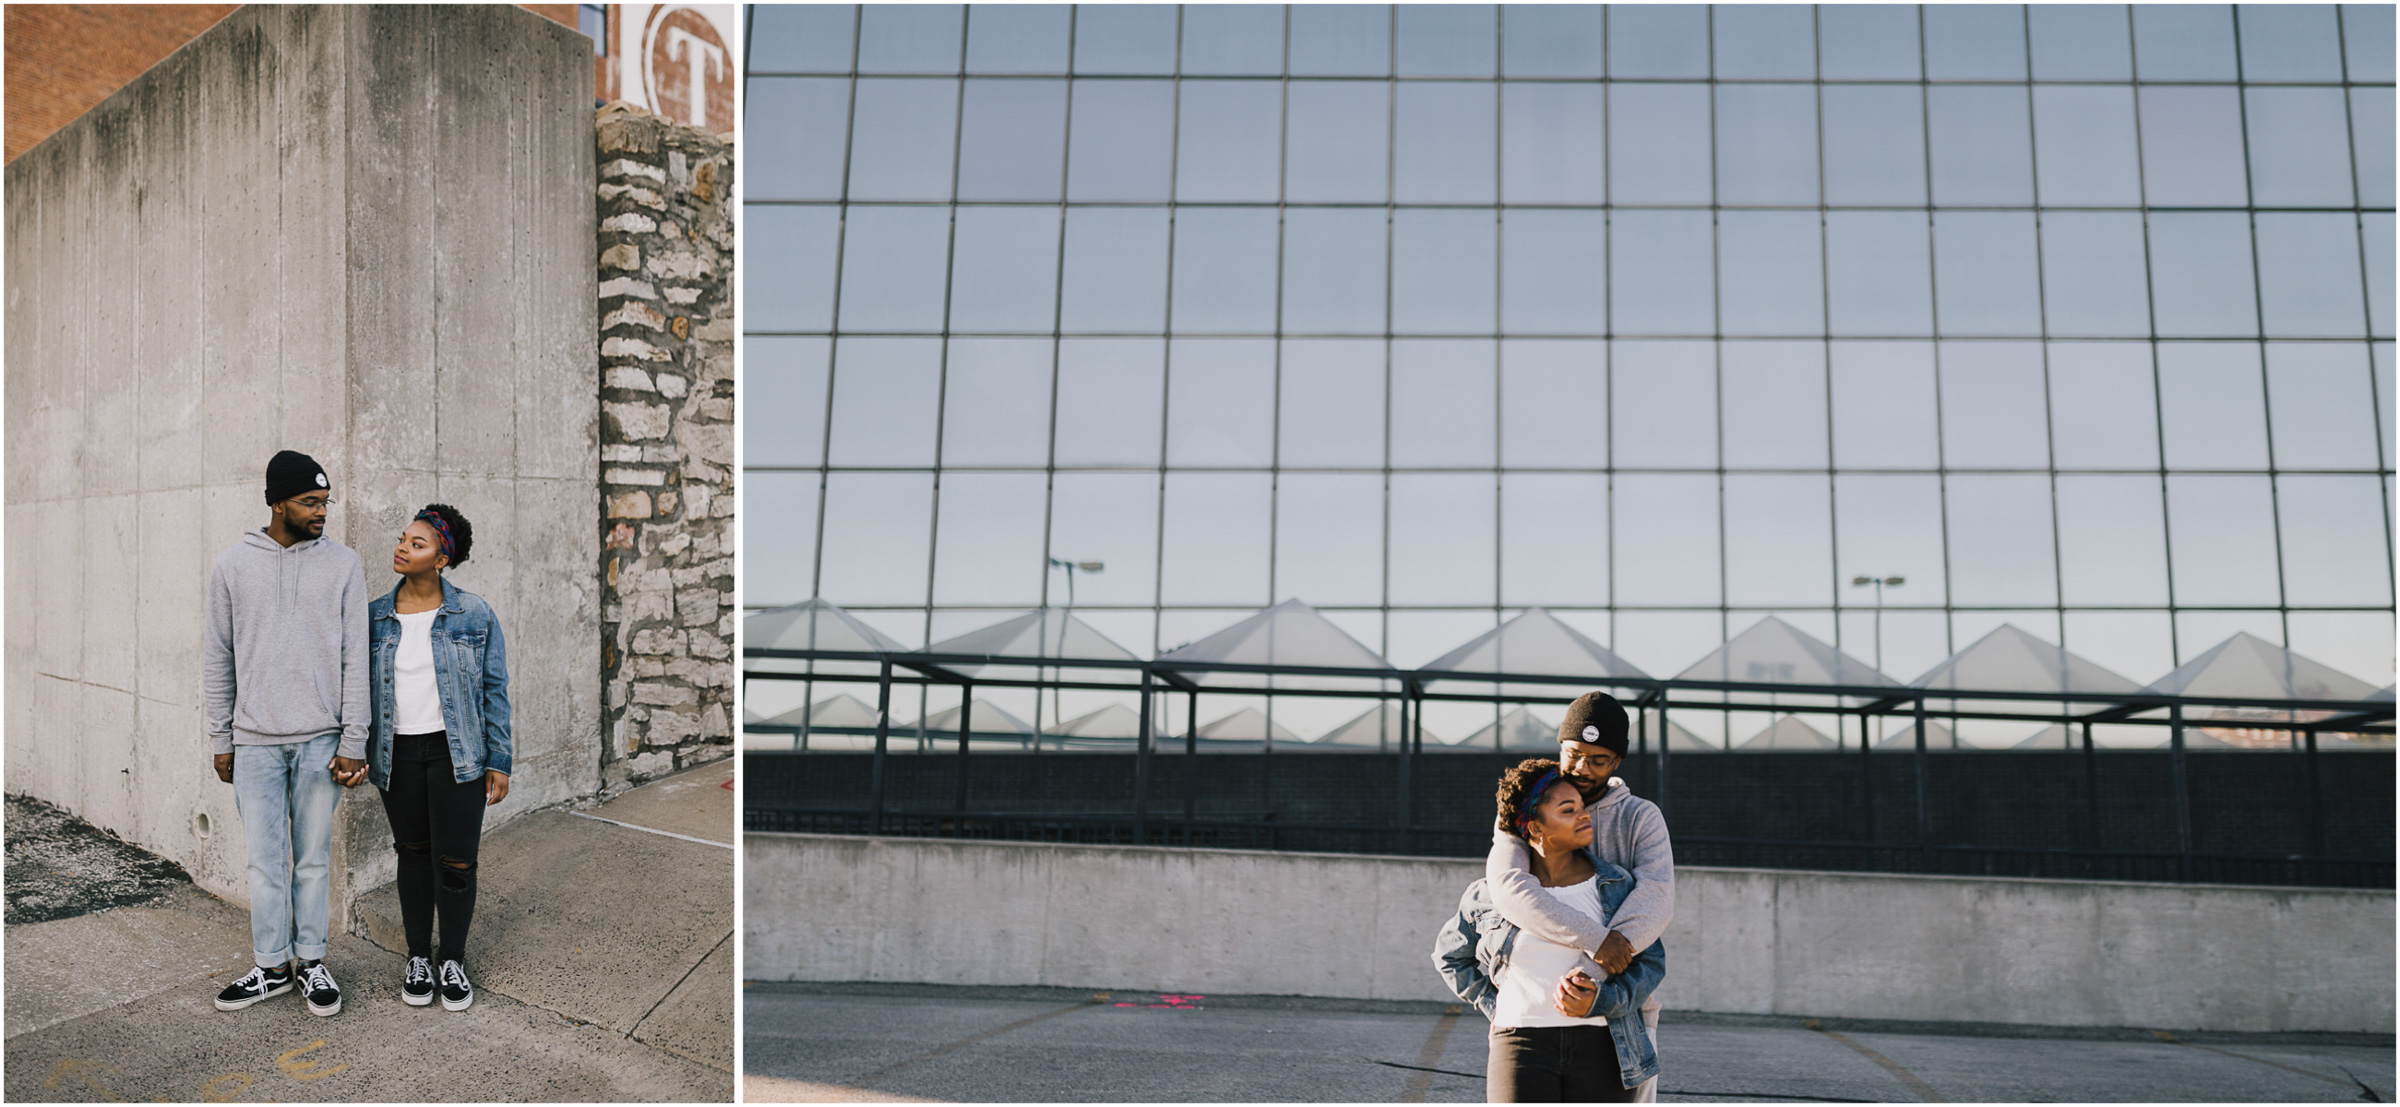 alyssa barletter photography downtown kansas city photo shoot rooftop parking garage sunrise session-14.jpg